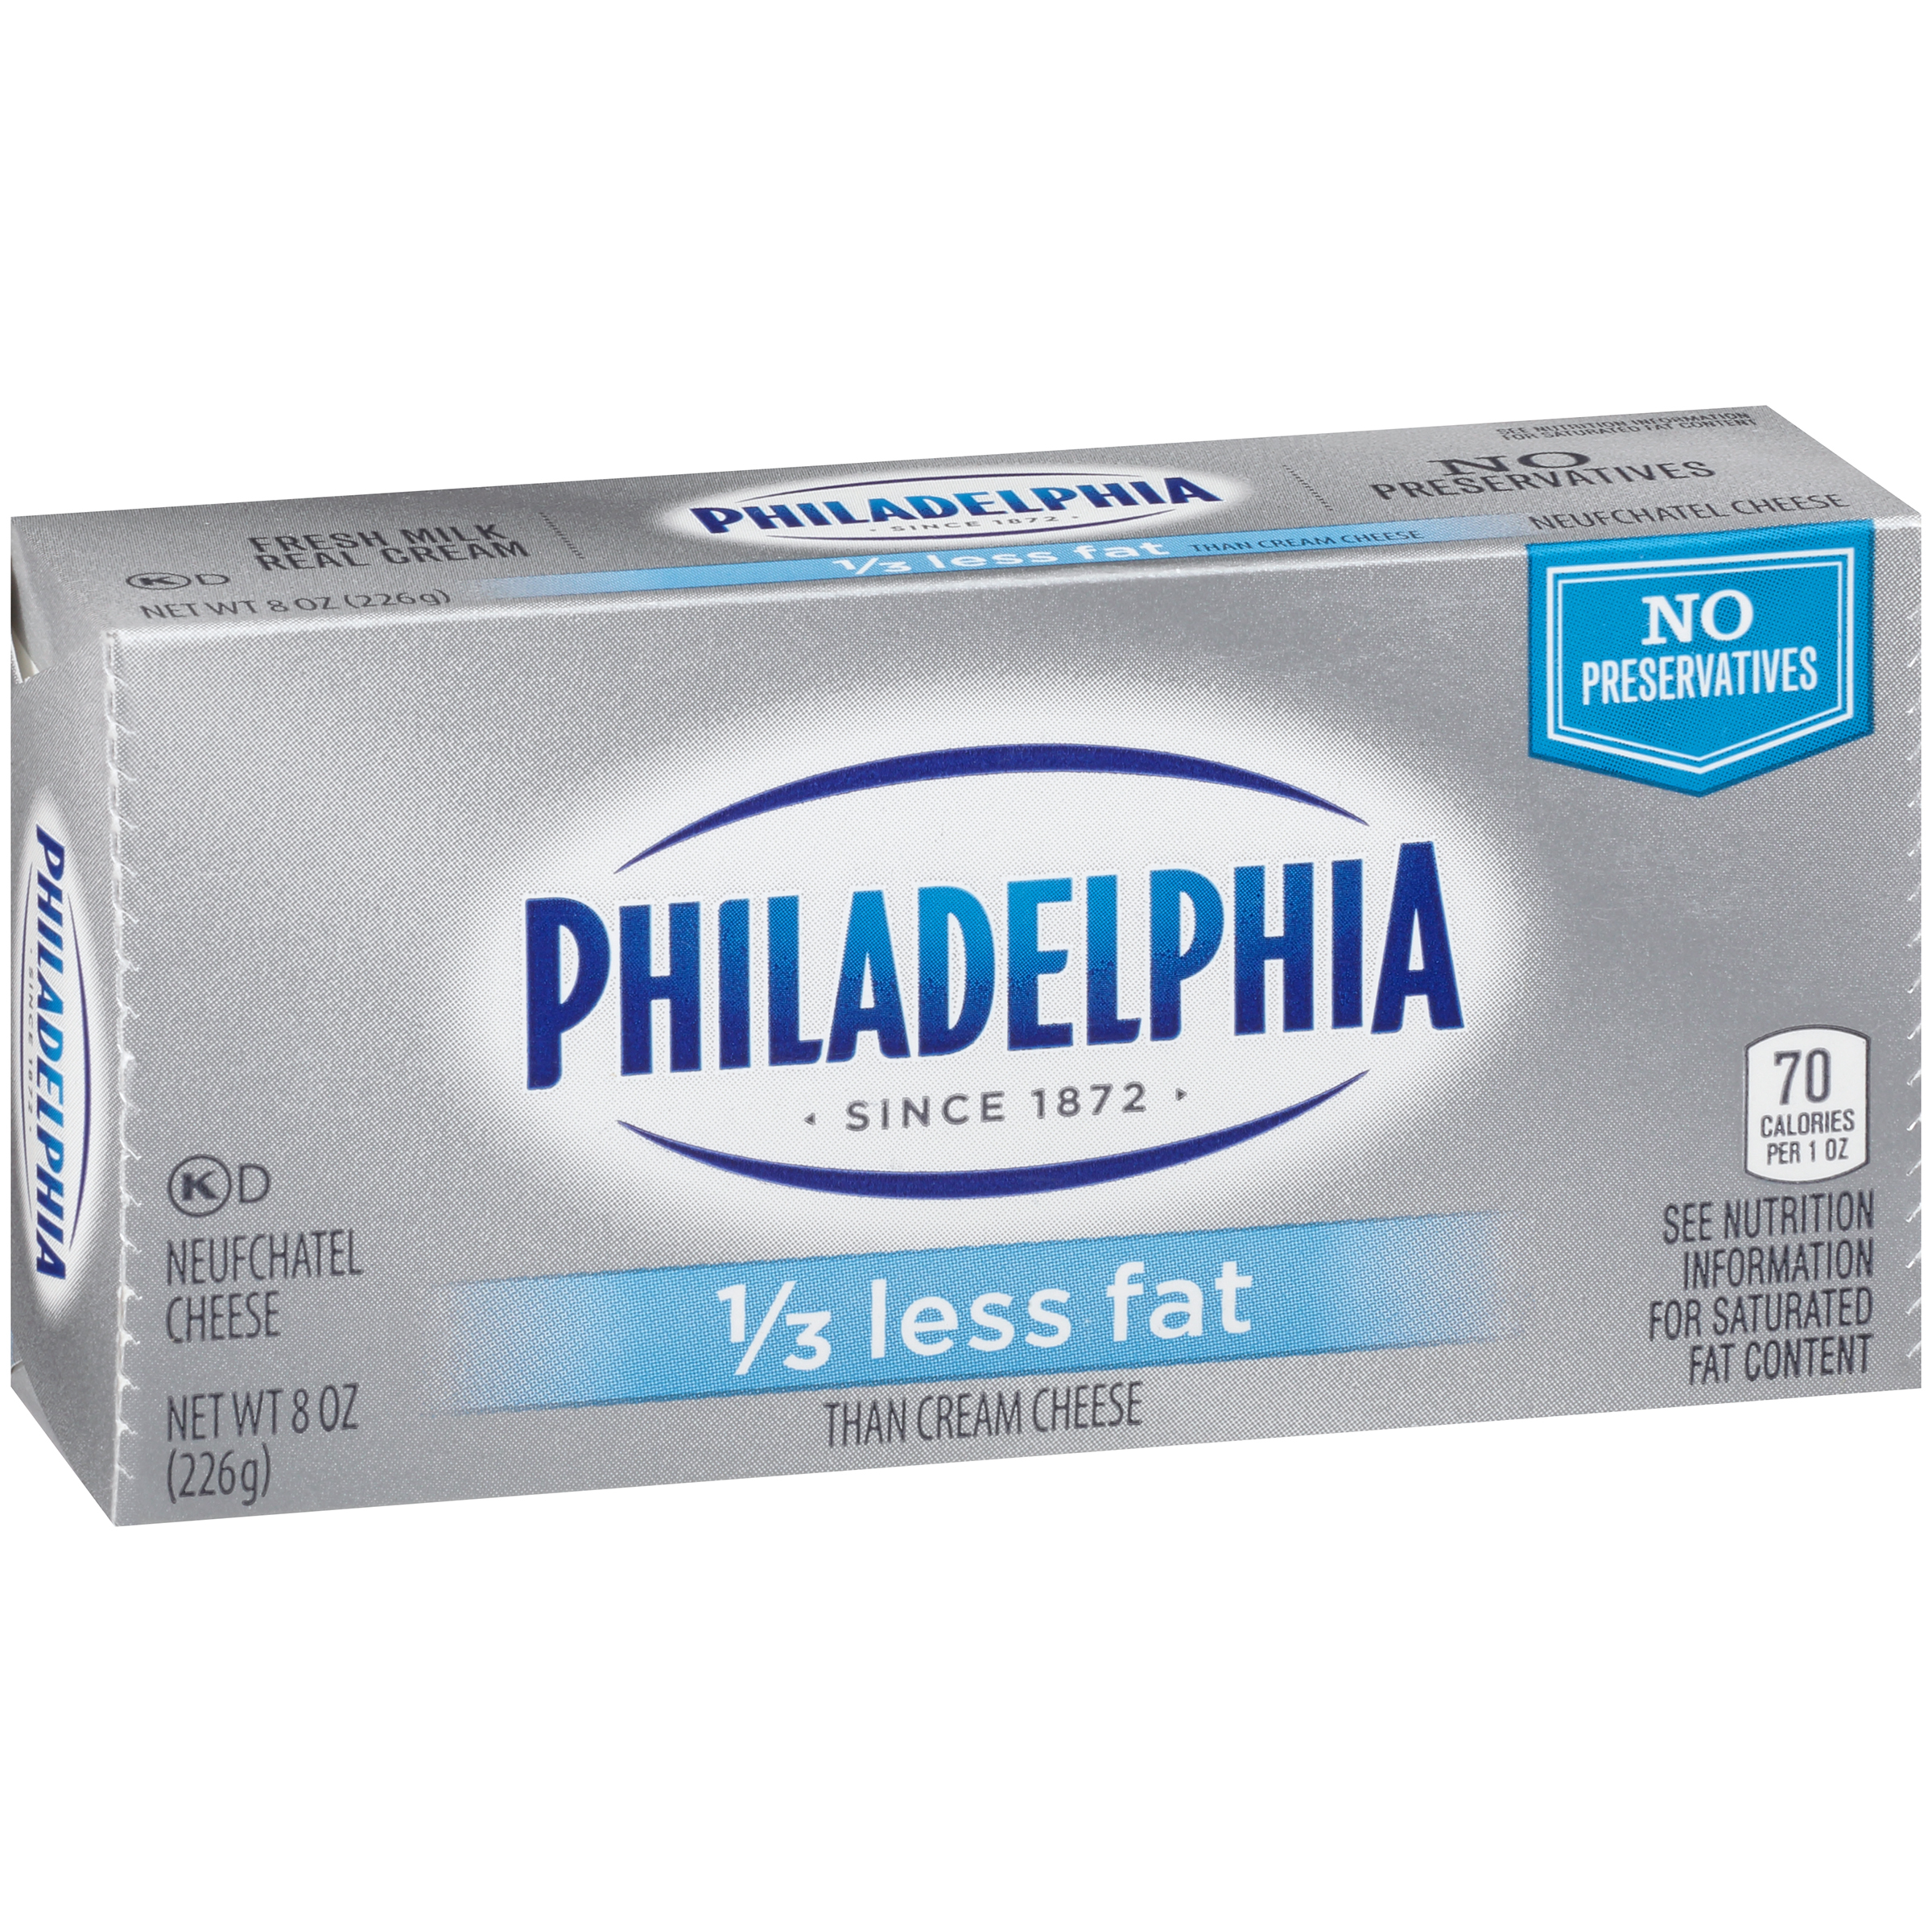 Philadelphia 1/3 Less Fat Cream Cheese